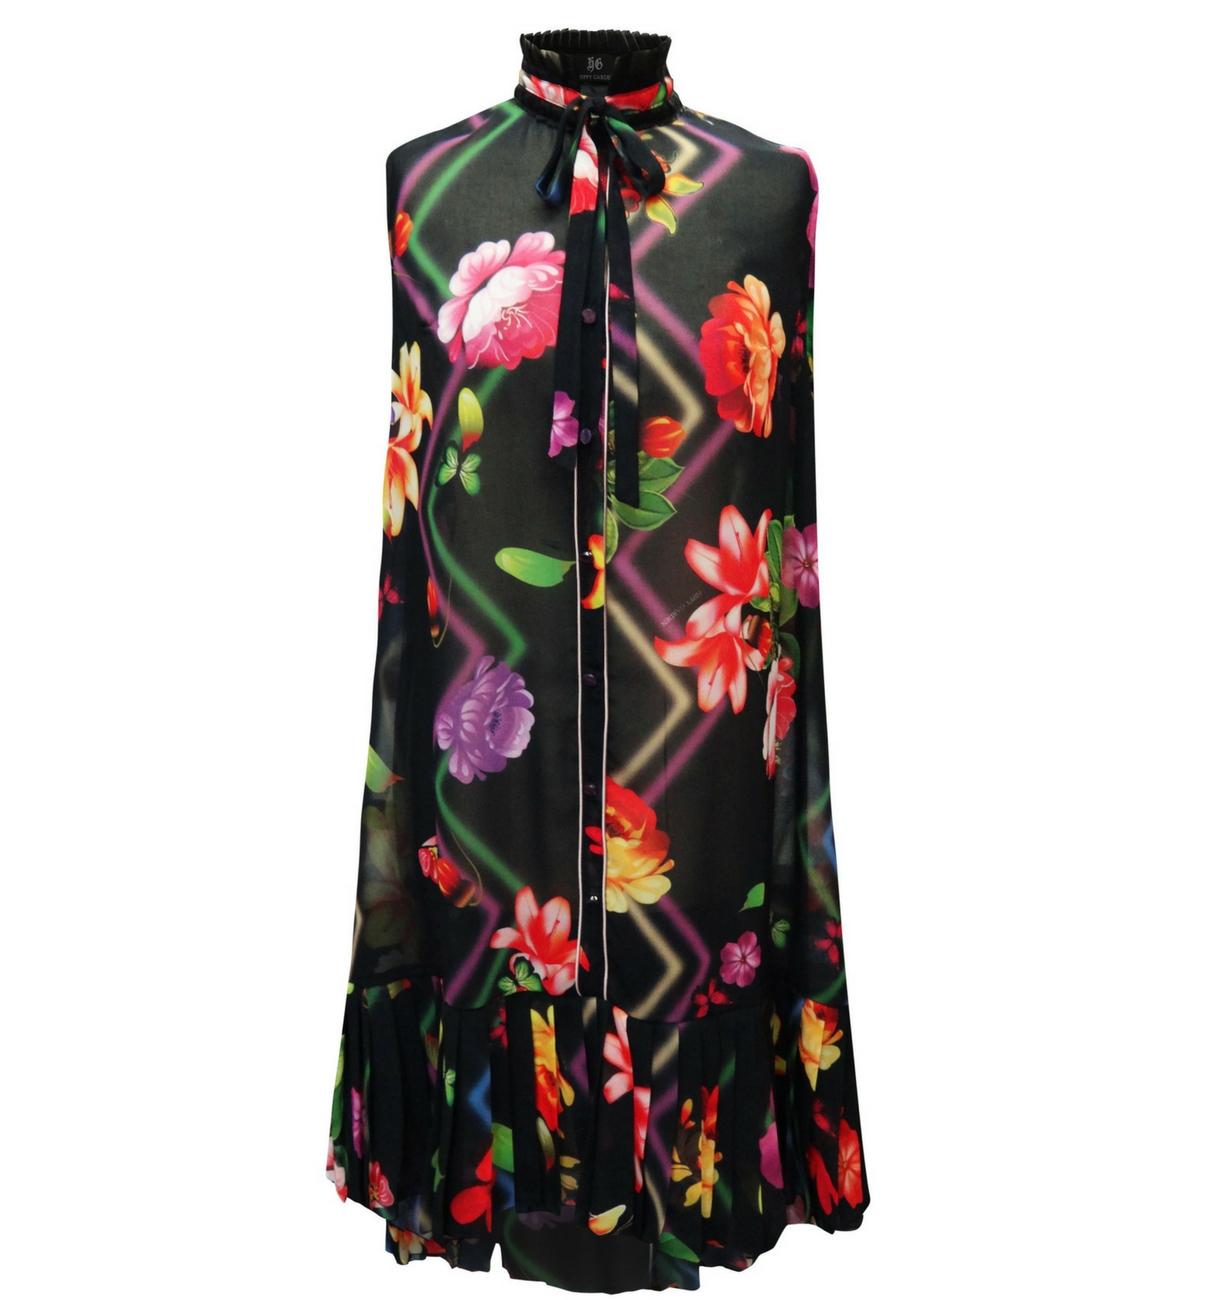 HIPPY GARDEN - FLORAL DRESS - GEENA